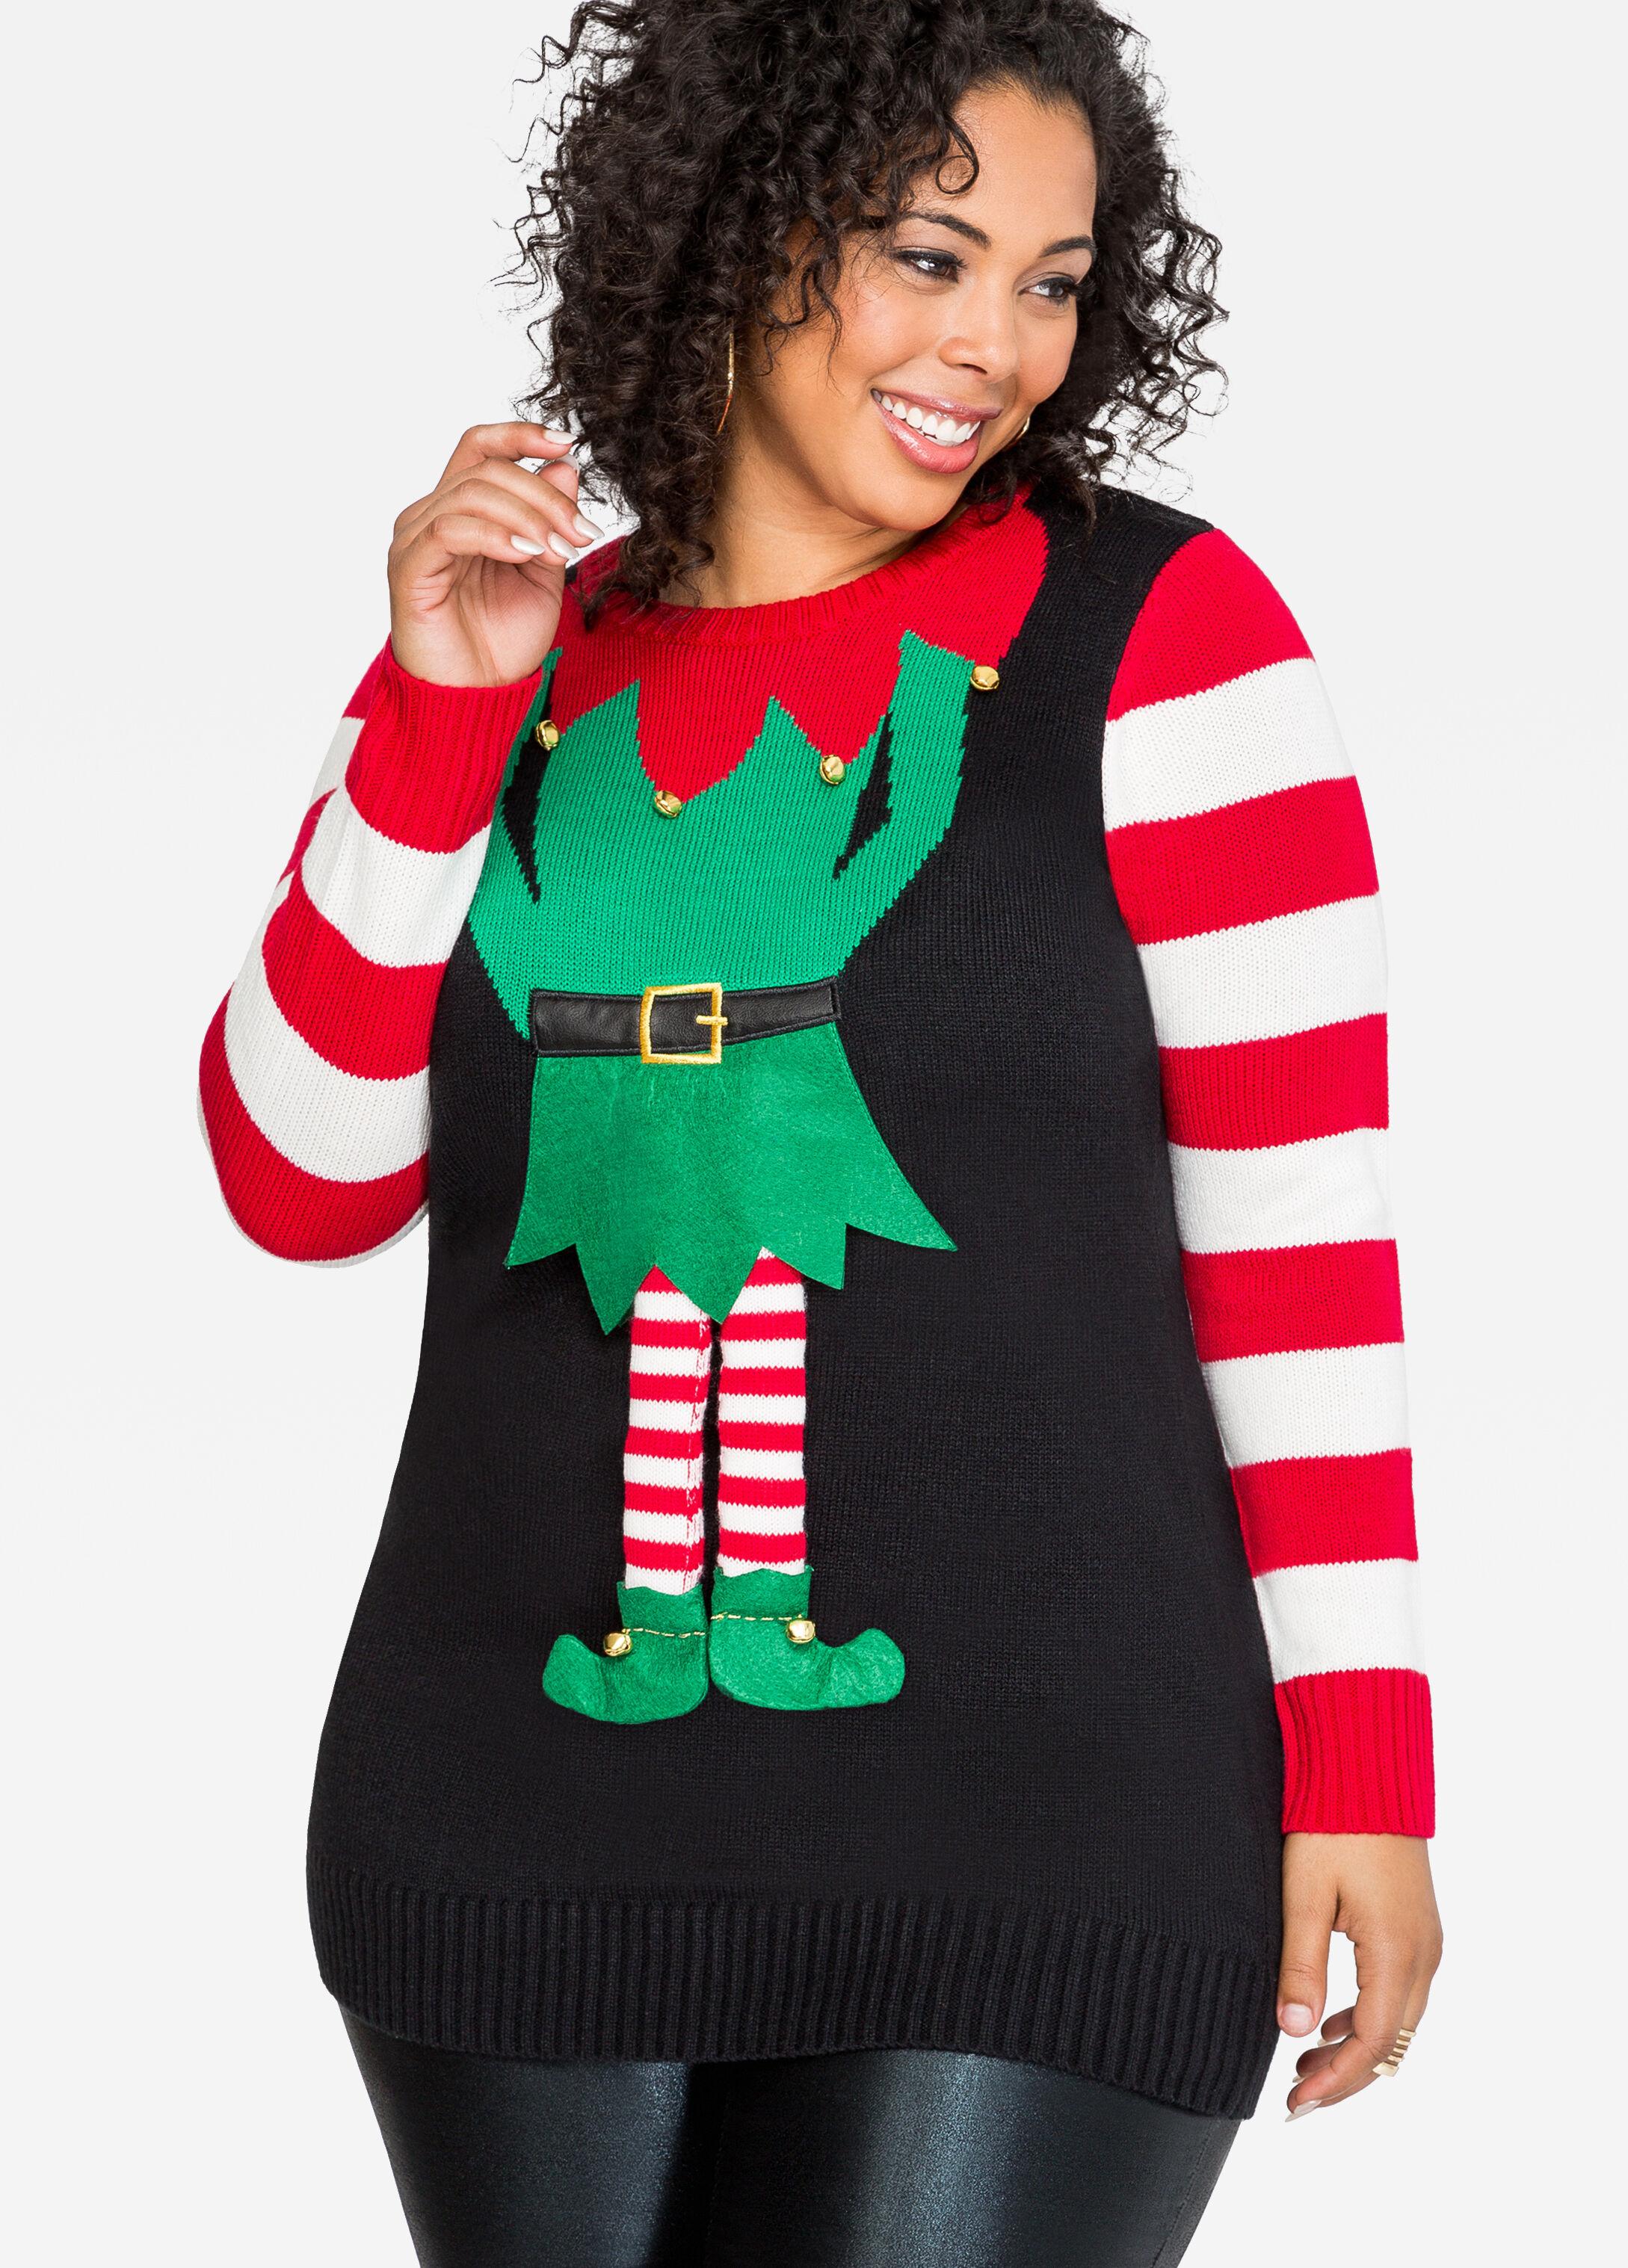 Jingle Bells Elf Holiday Sweater-Plus Size Ugly Christmas ...